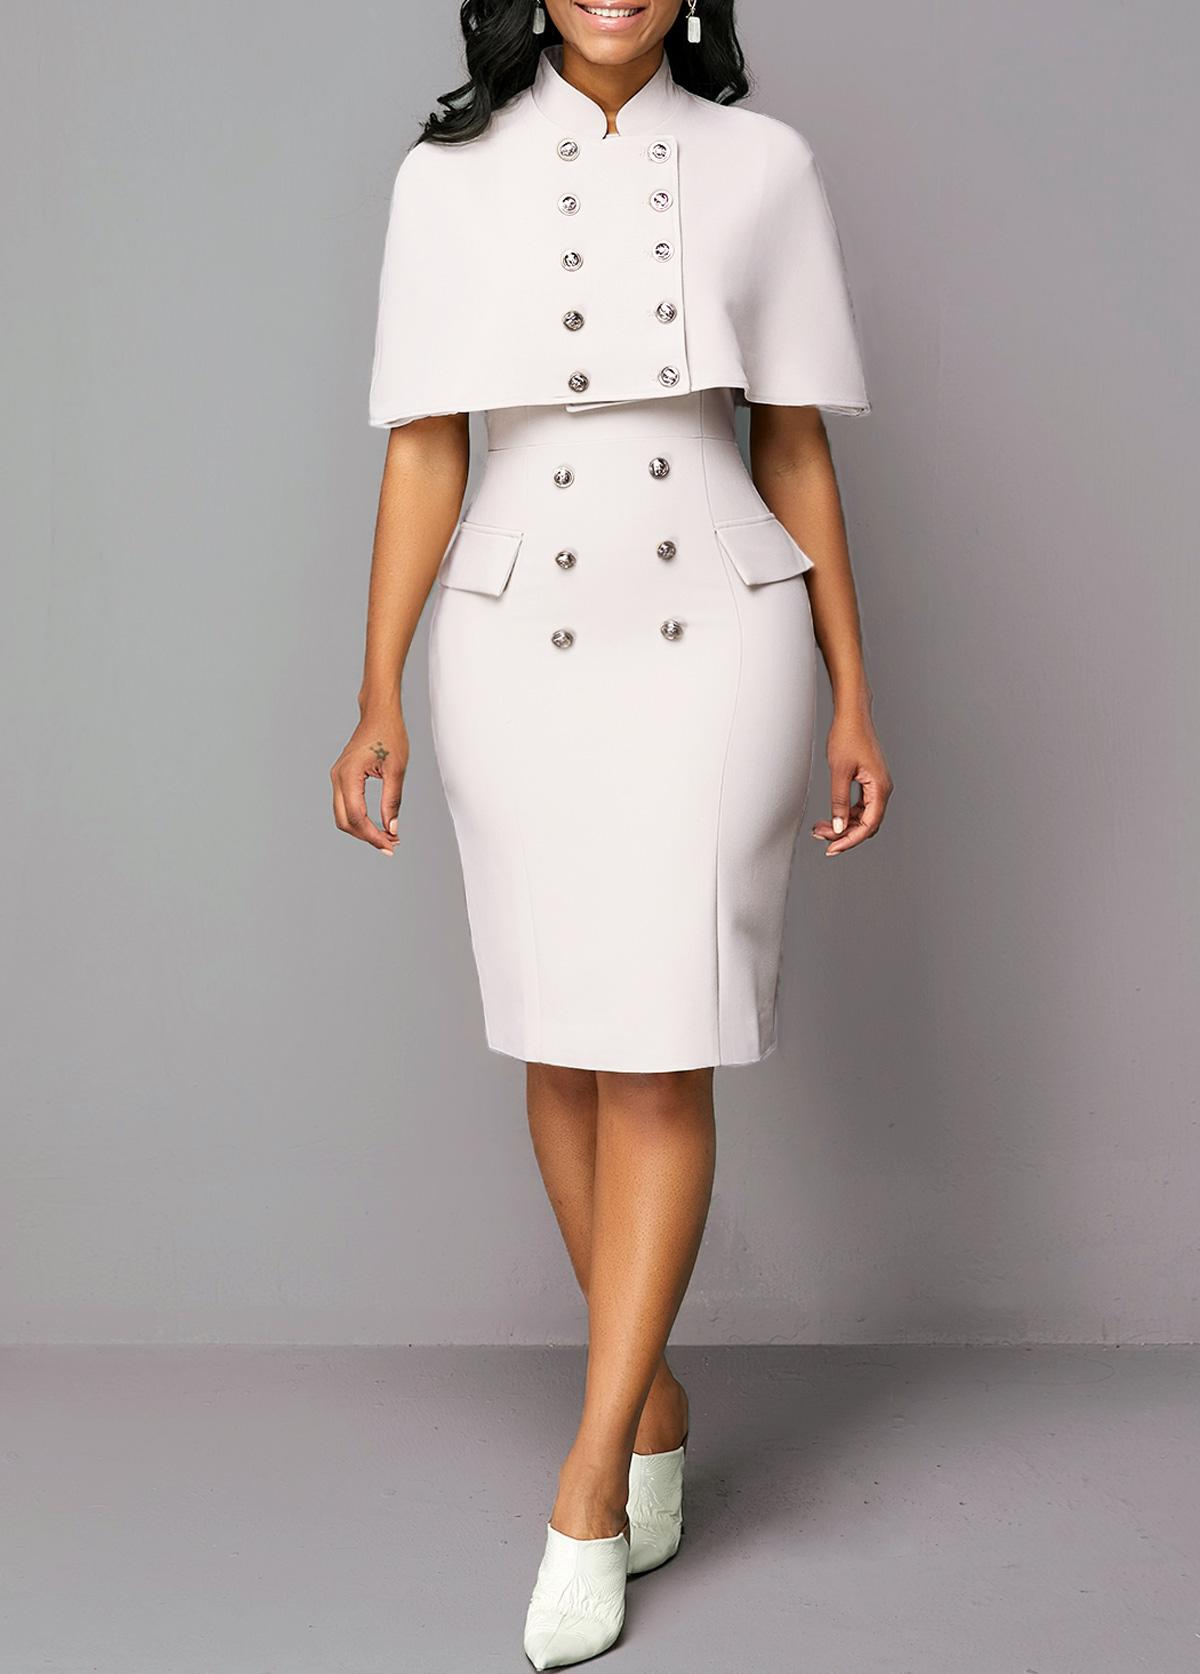 Button Detail Cape Shoulder Top and Sheath Dress